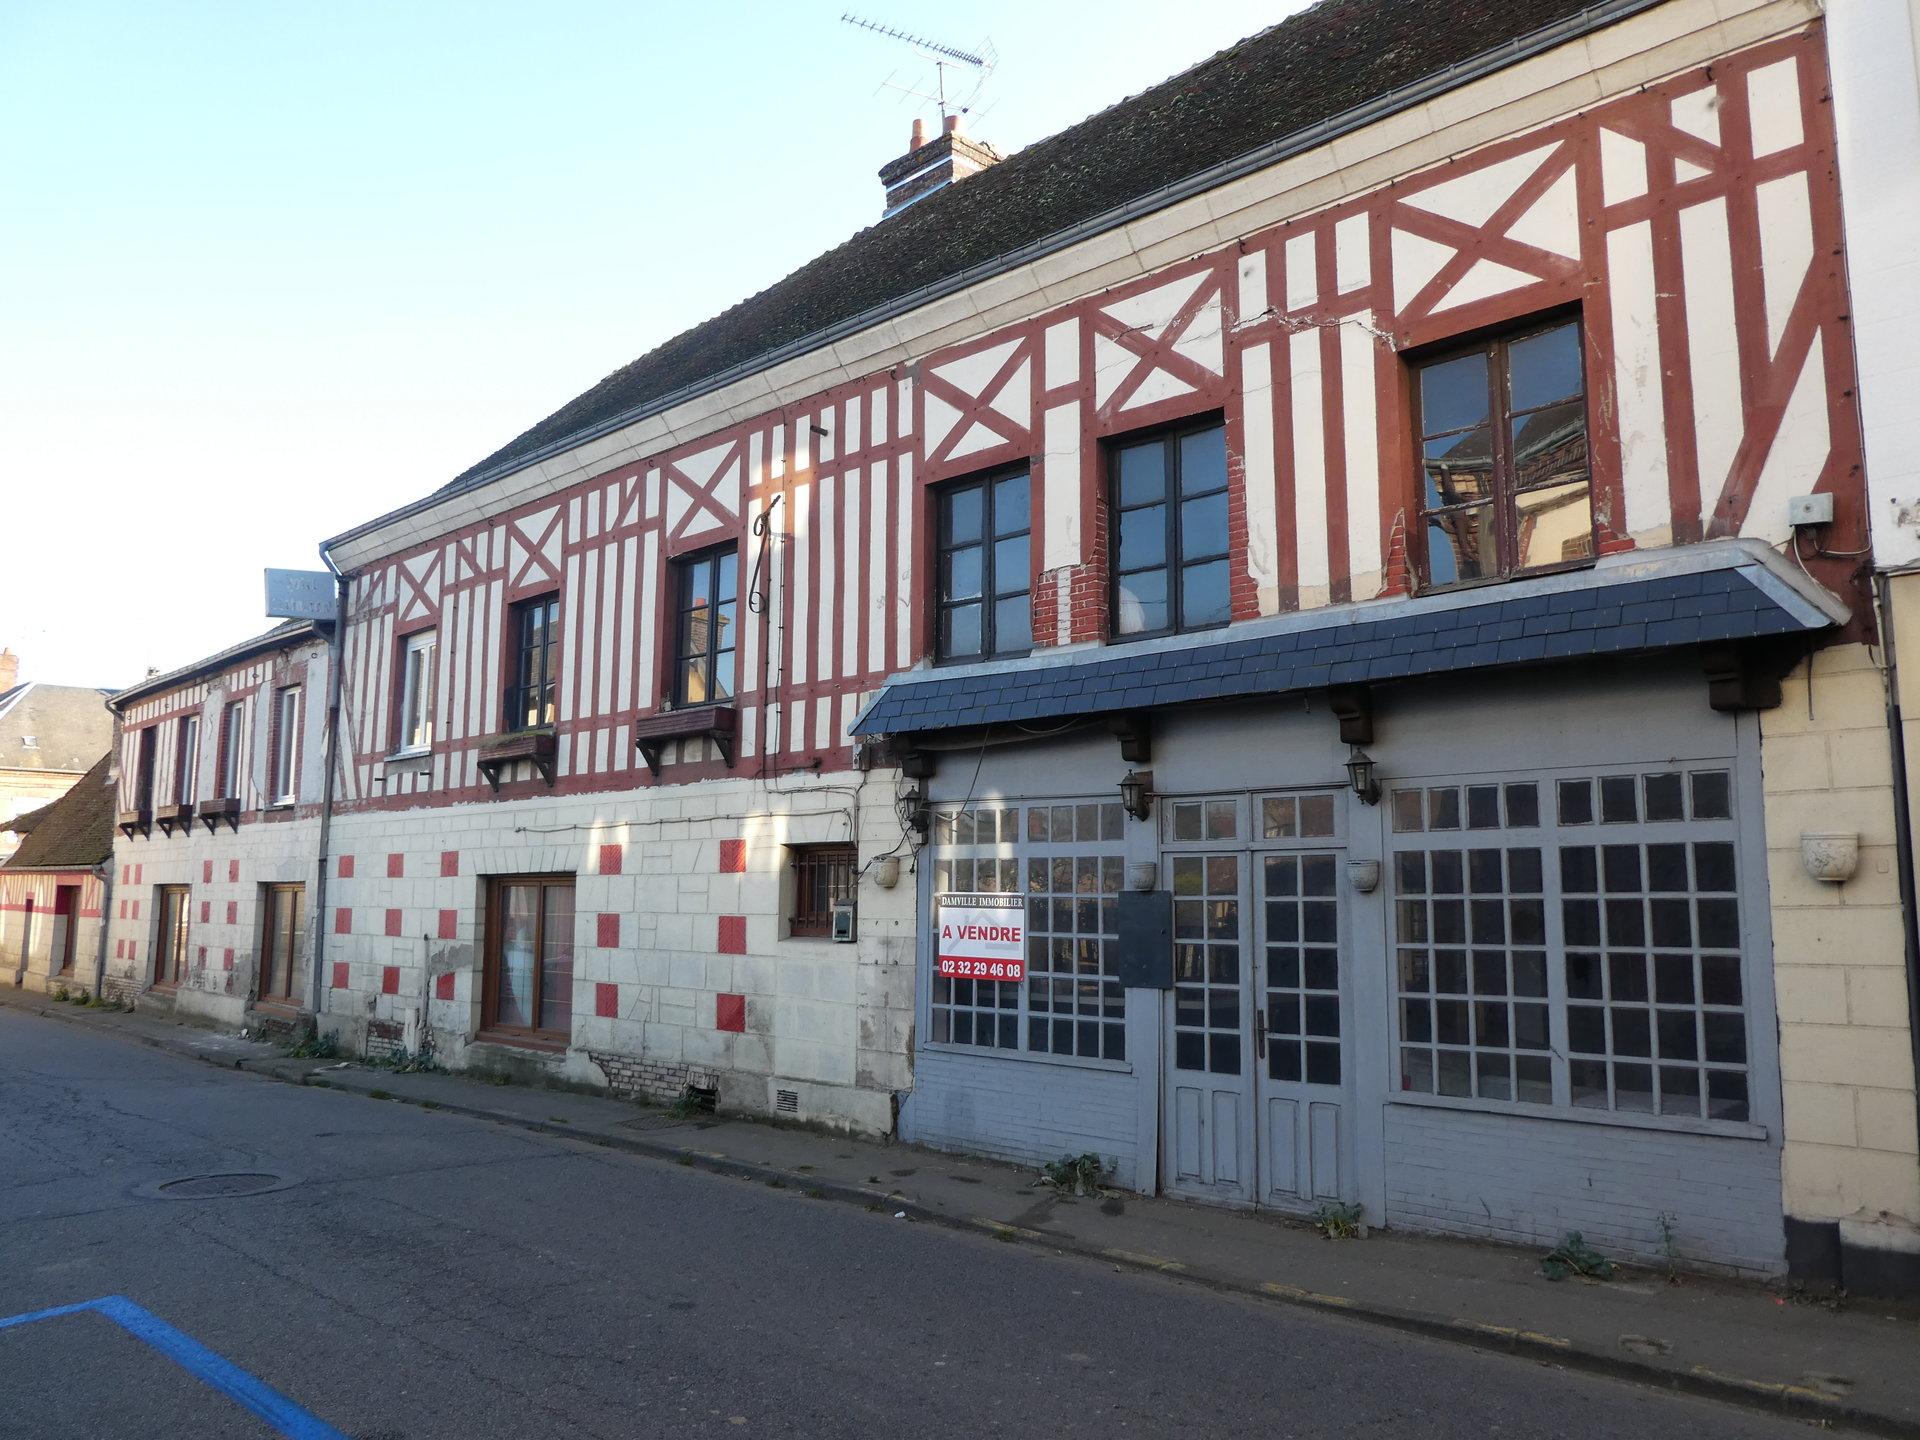 DAMVILLE centre